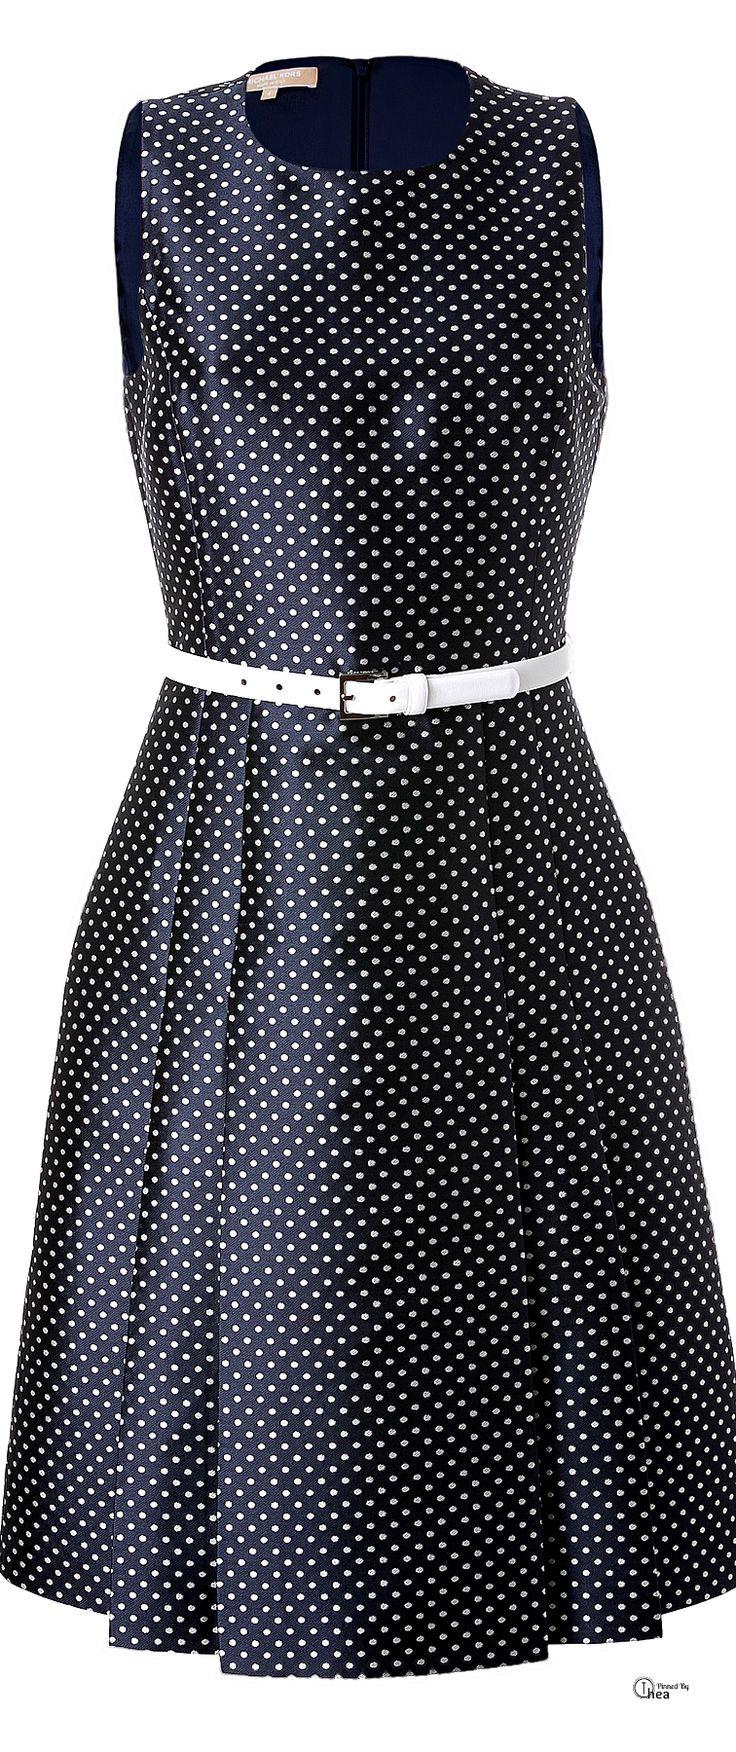 Michael Kors ● Polka Dot Cocktail Dress